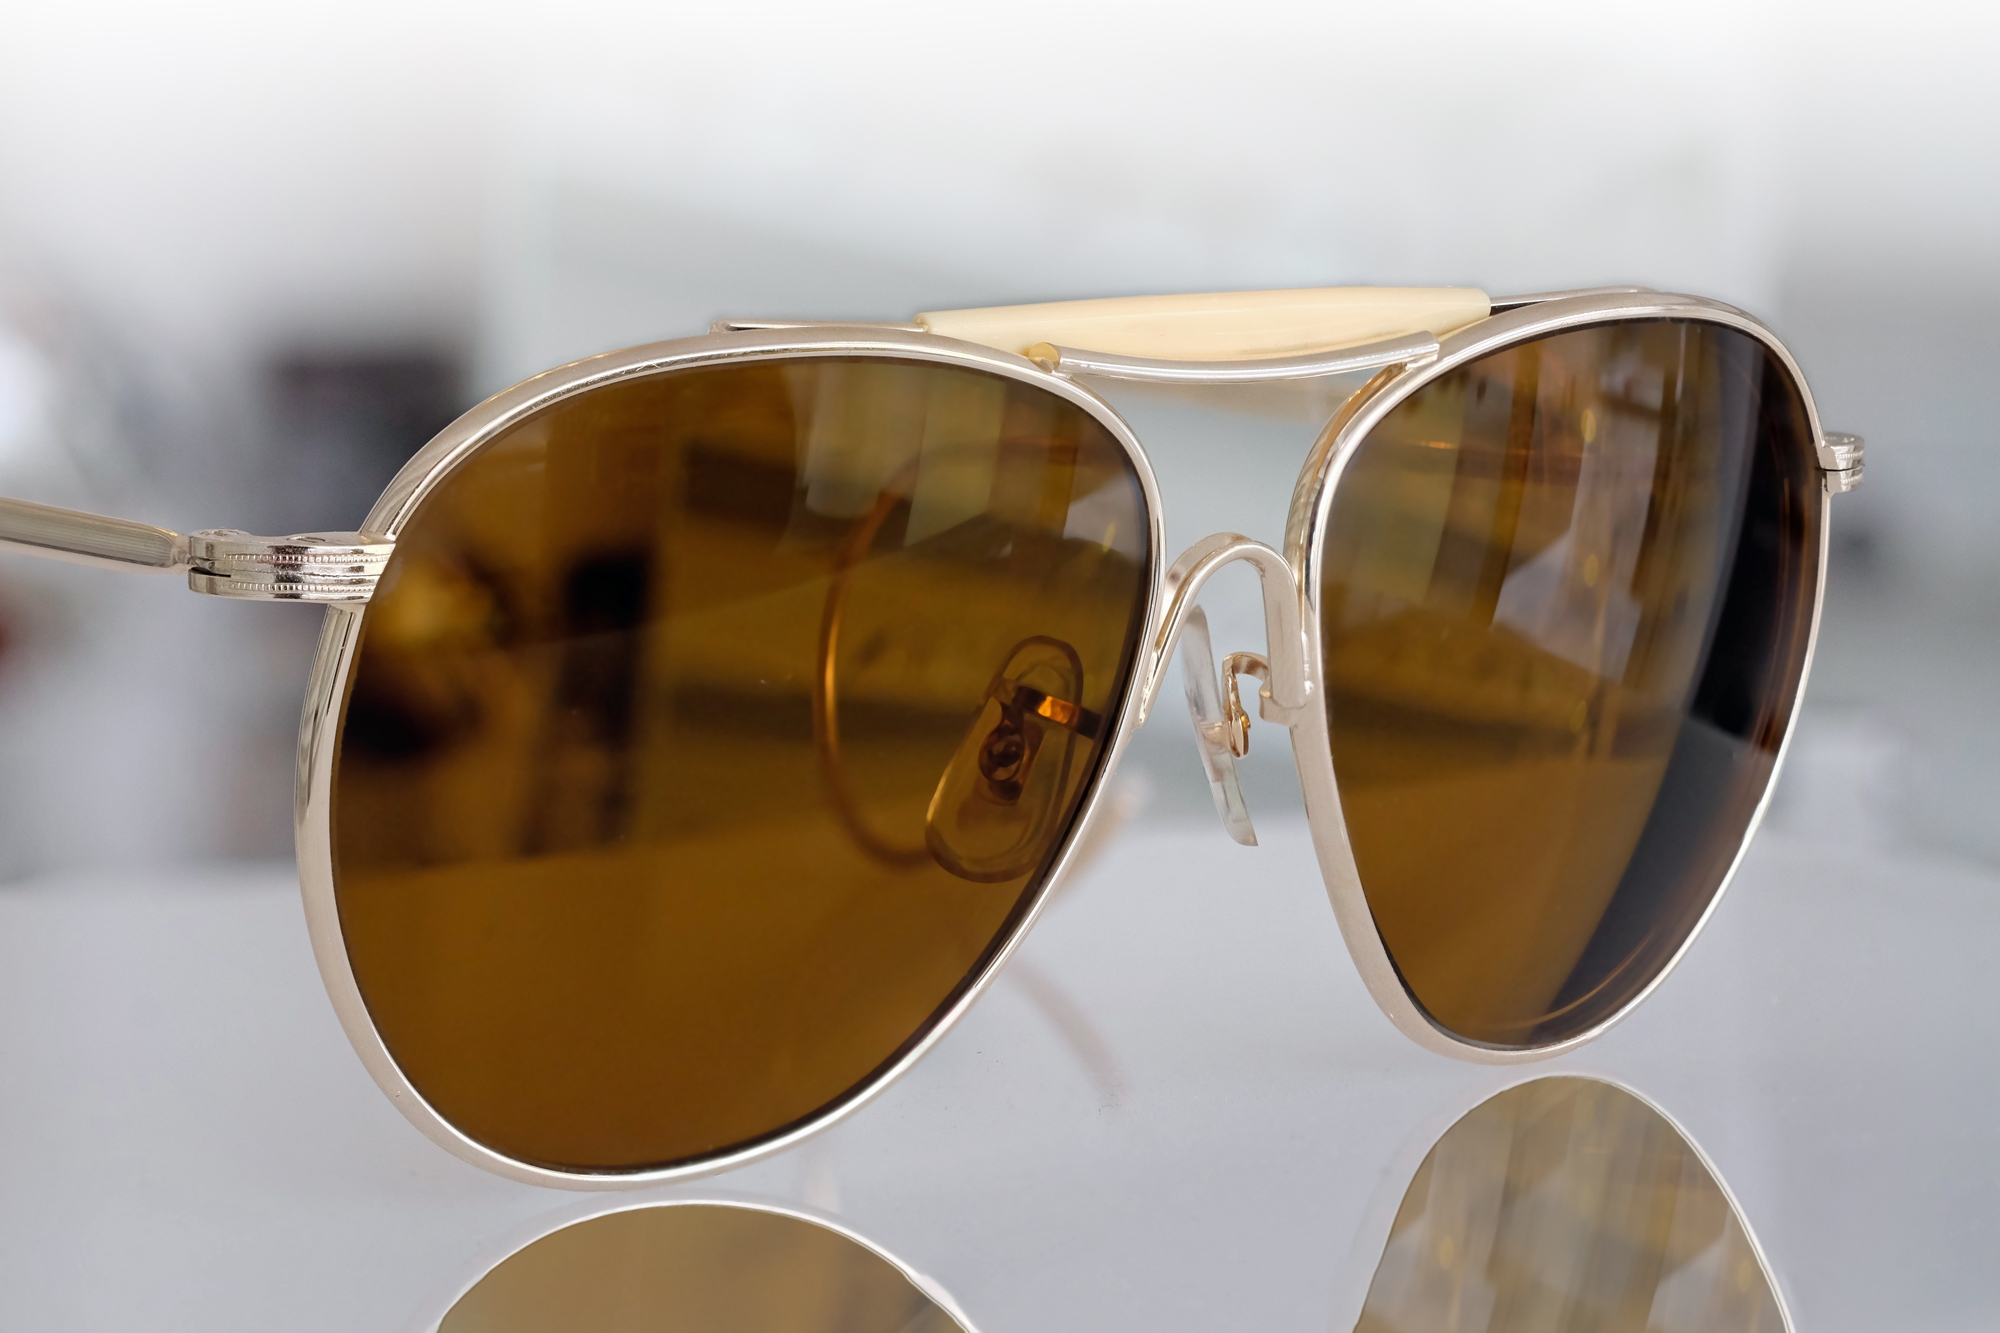 Schaufenster Nr. 005: American Optical